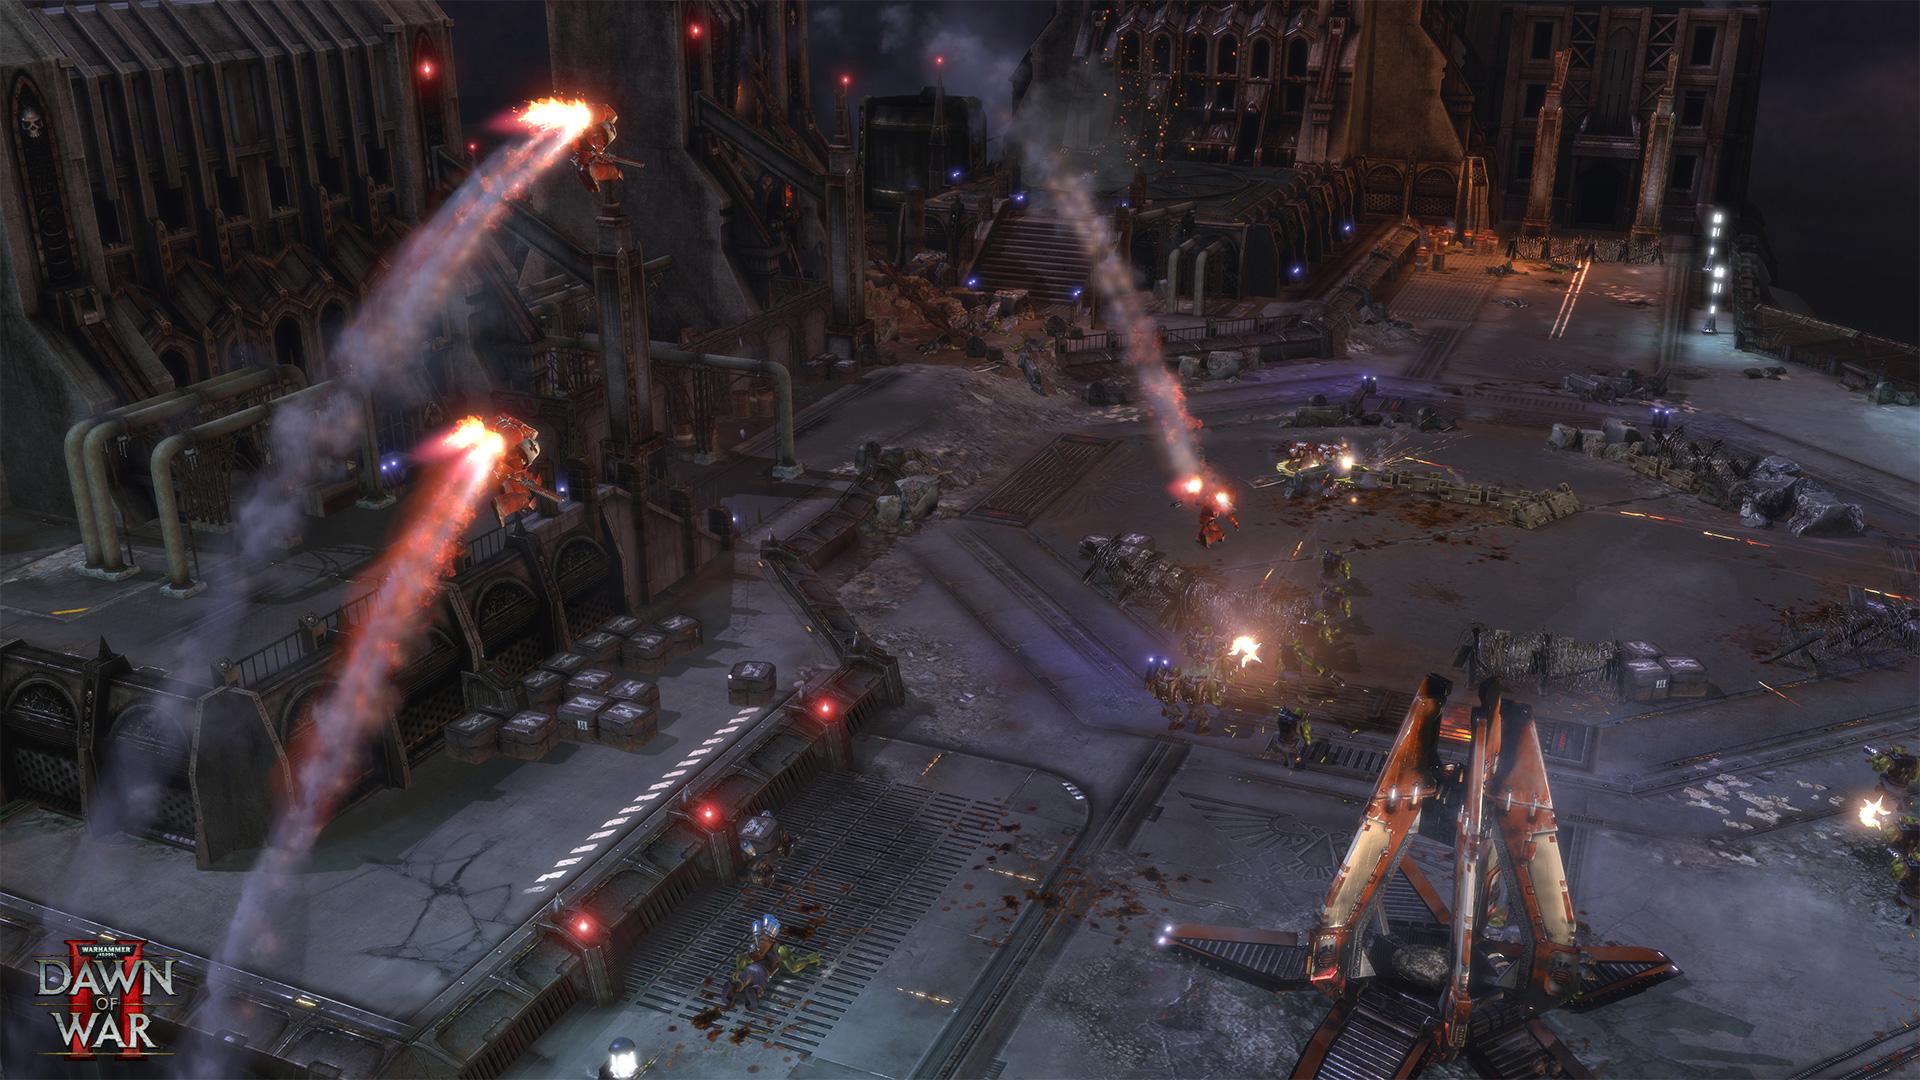 (Warhammer 40,000 DOW 2, Relic Entertainment)